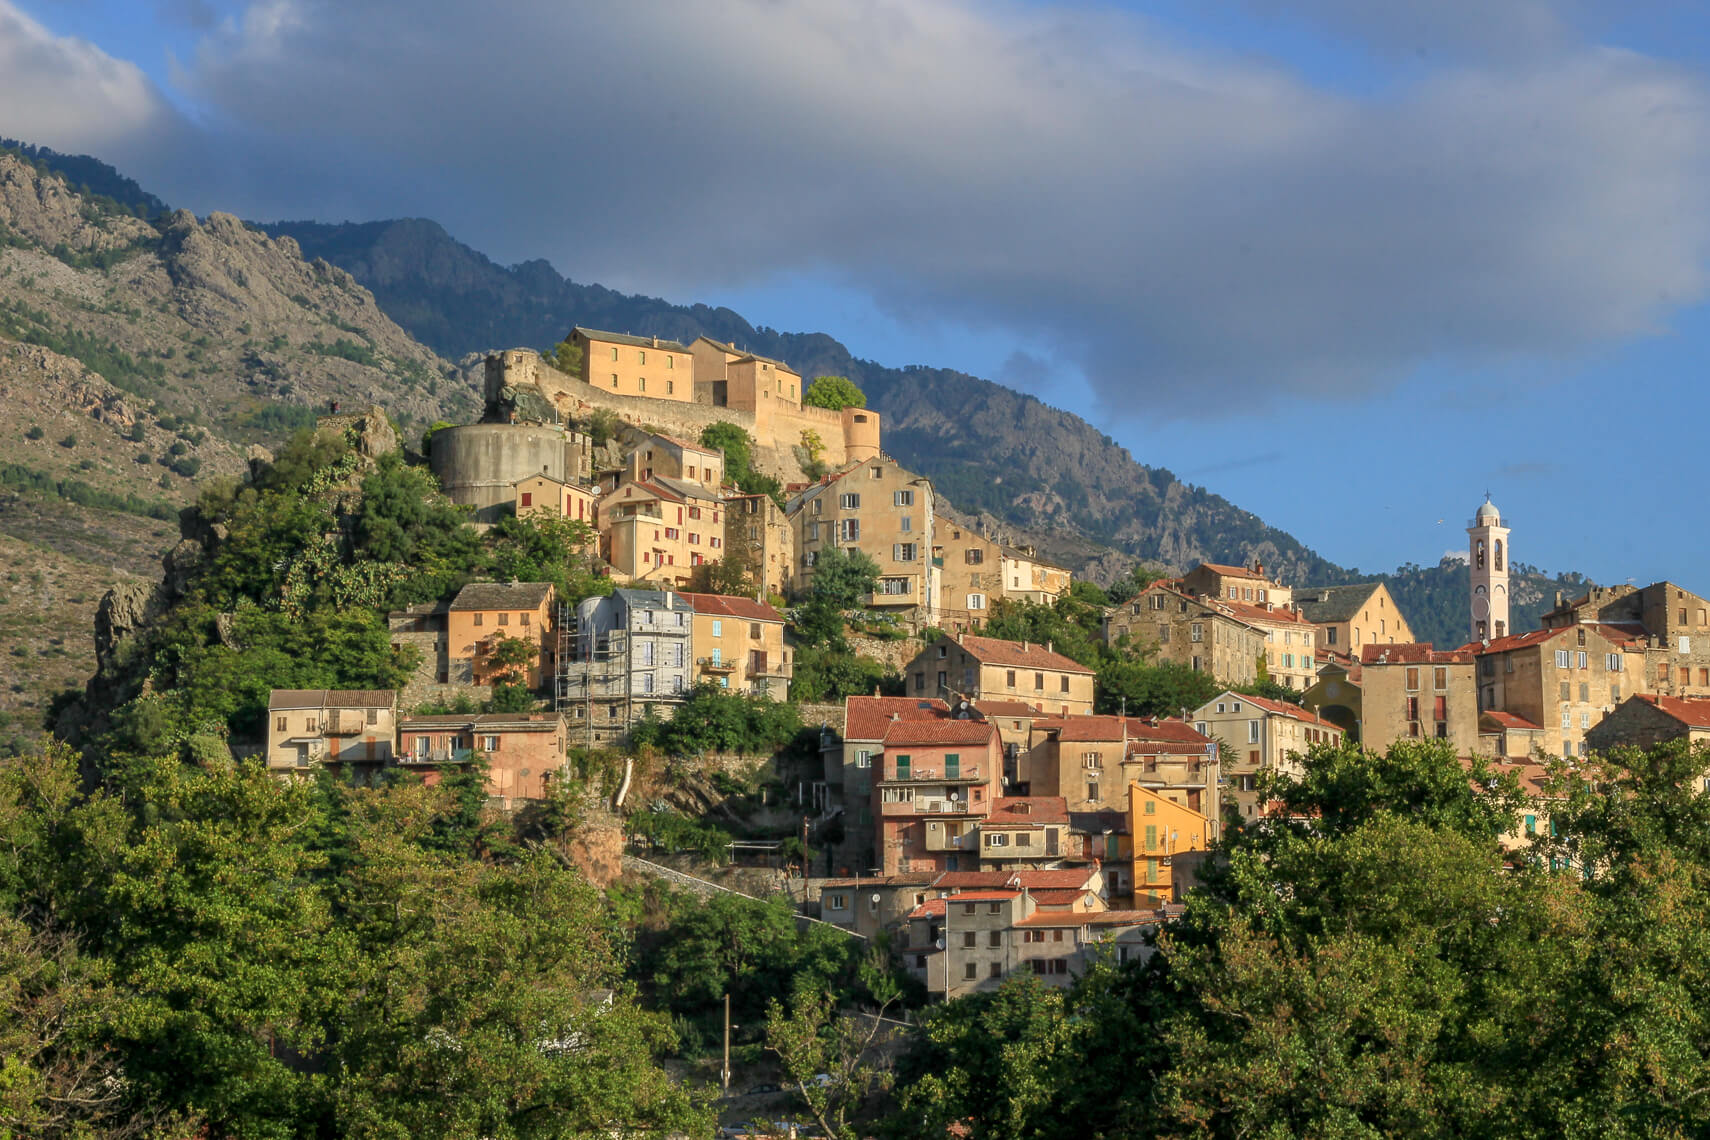 Corte : au coeur de la Corse